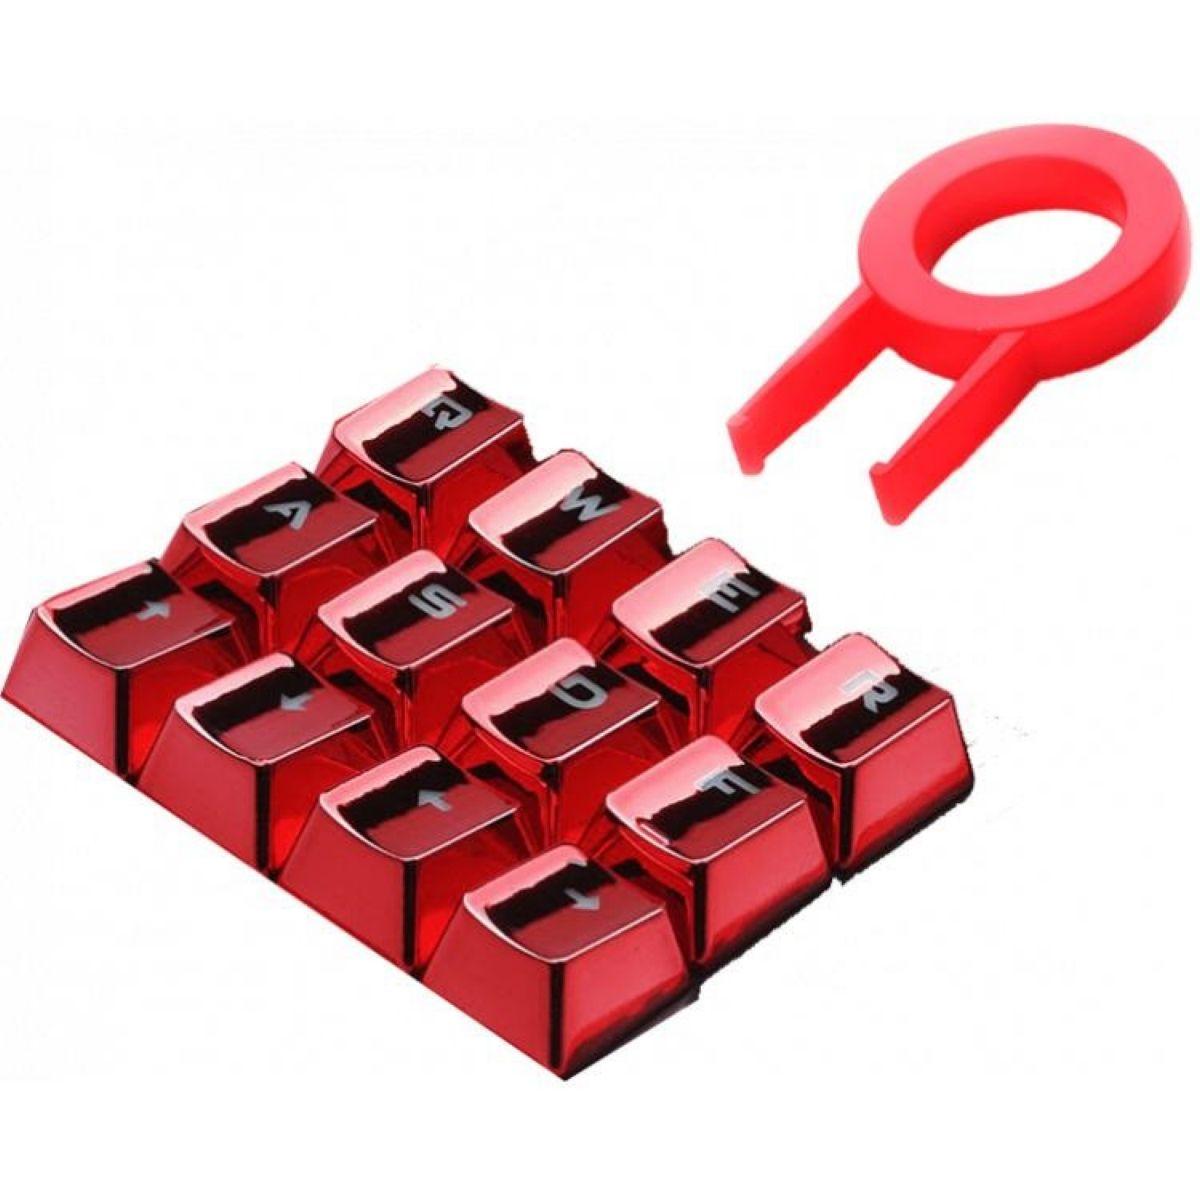 Teclas Mx - Keycaps Redragon Red A103r